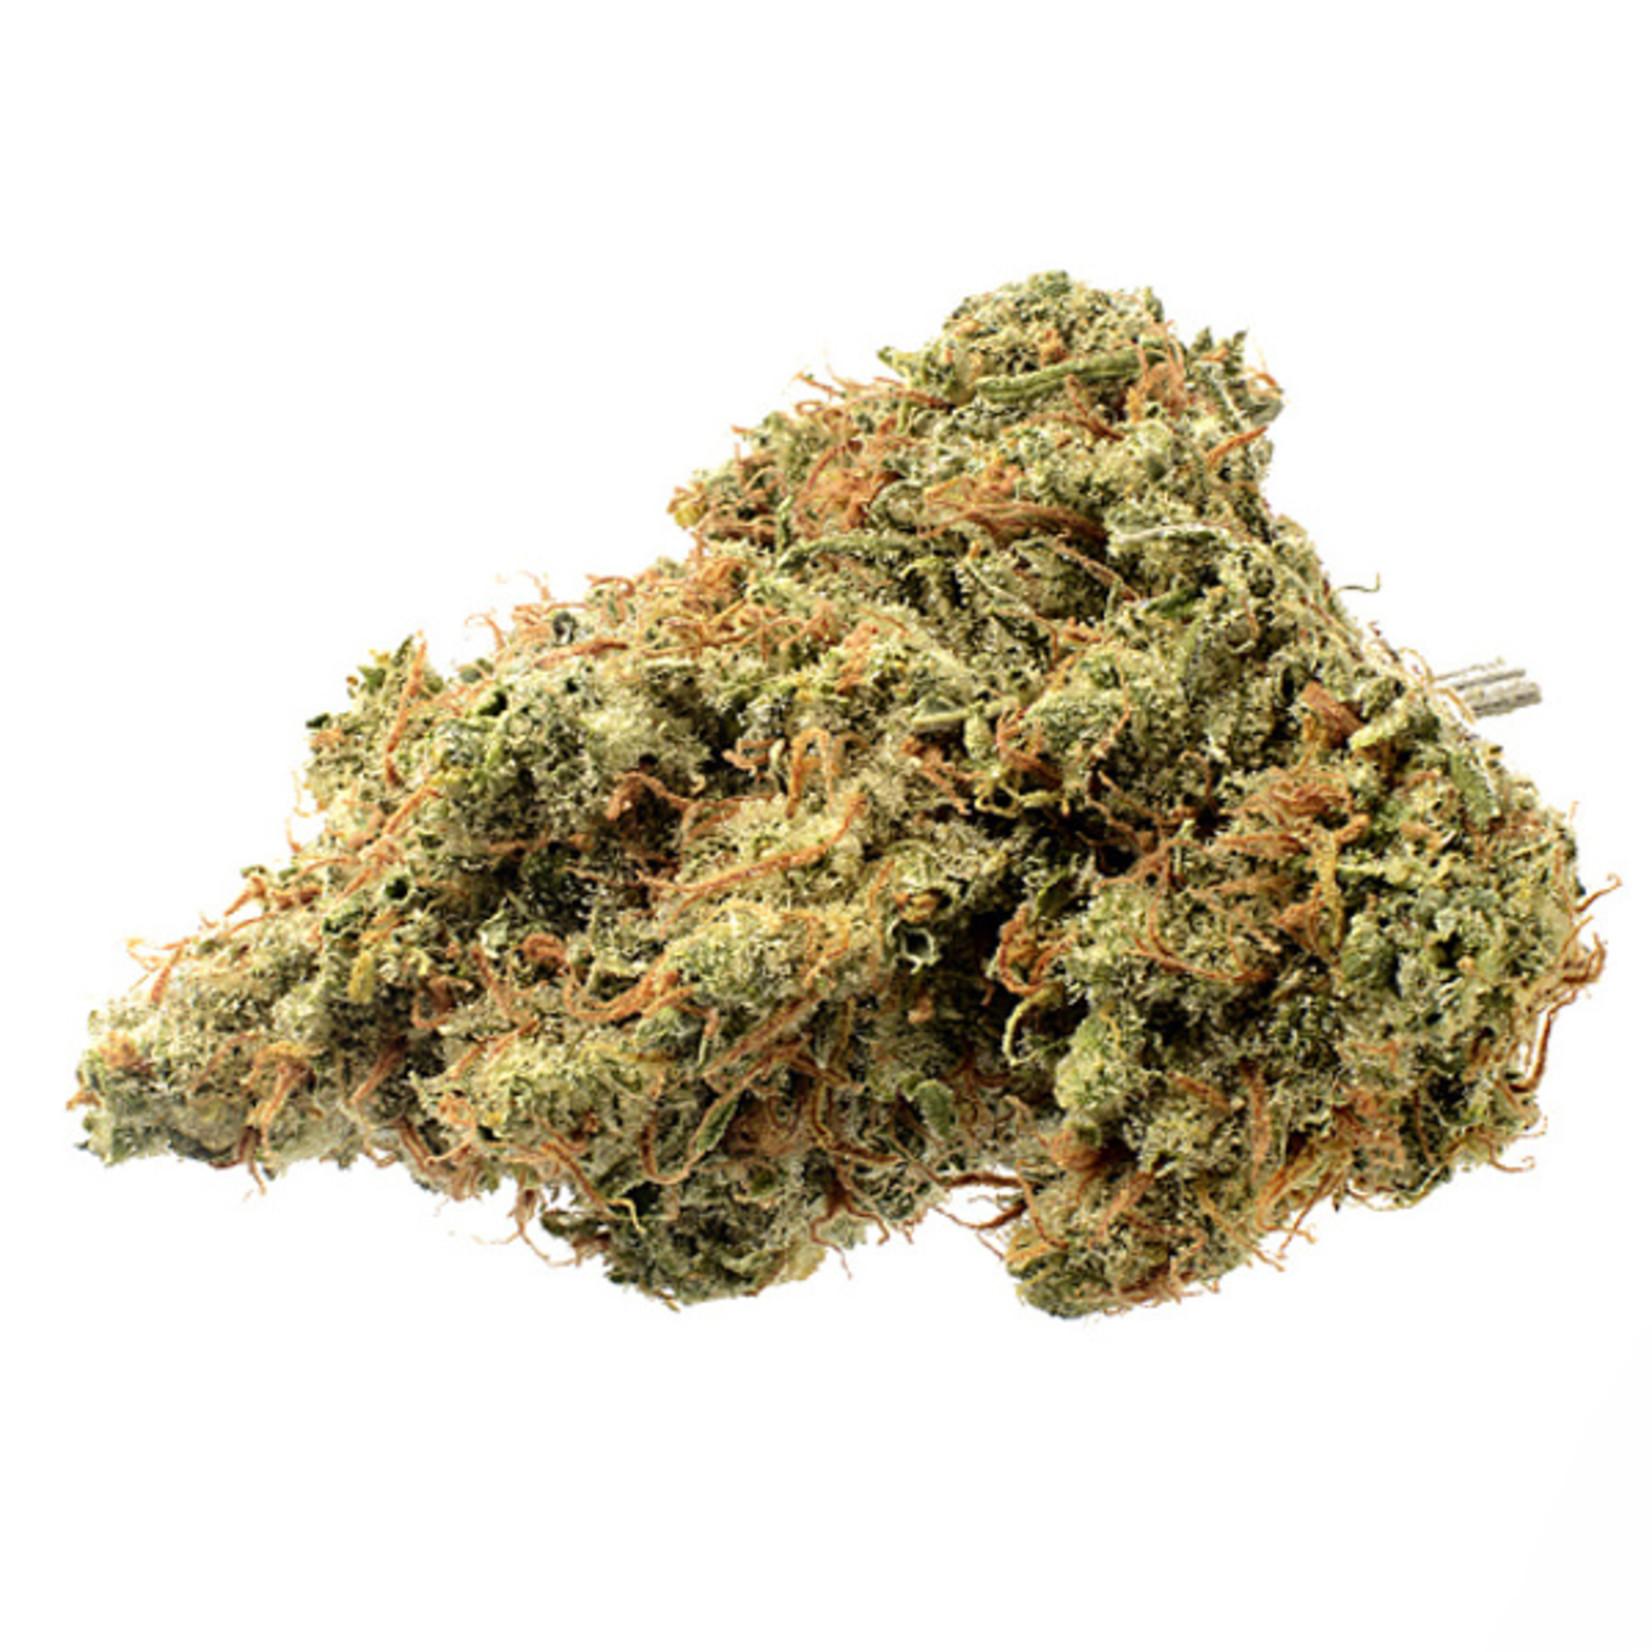 Strawberry Glue Cannabis Seeds